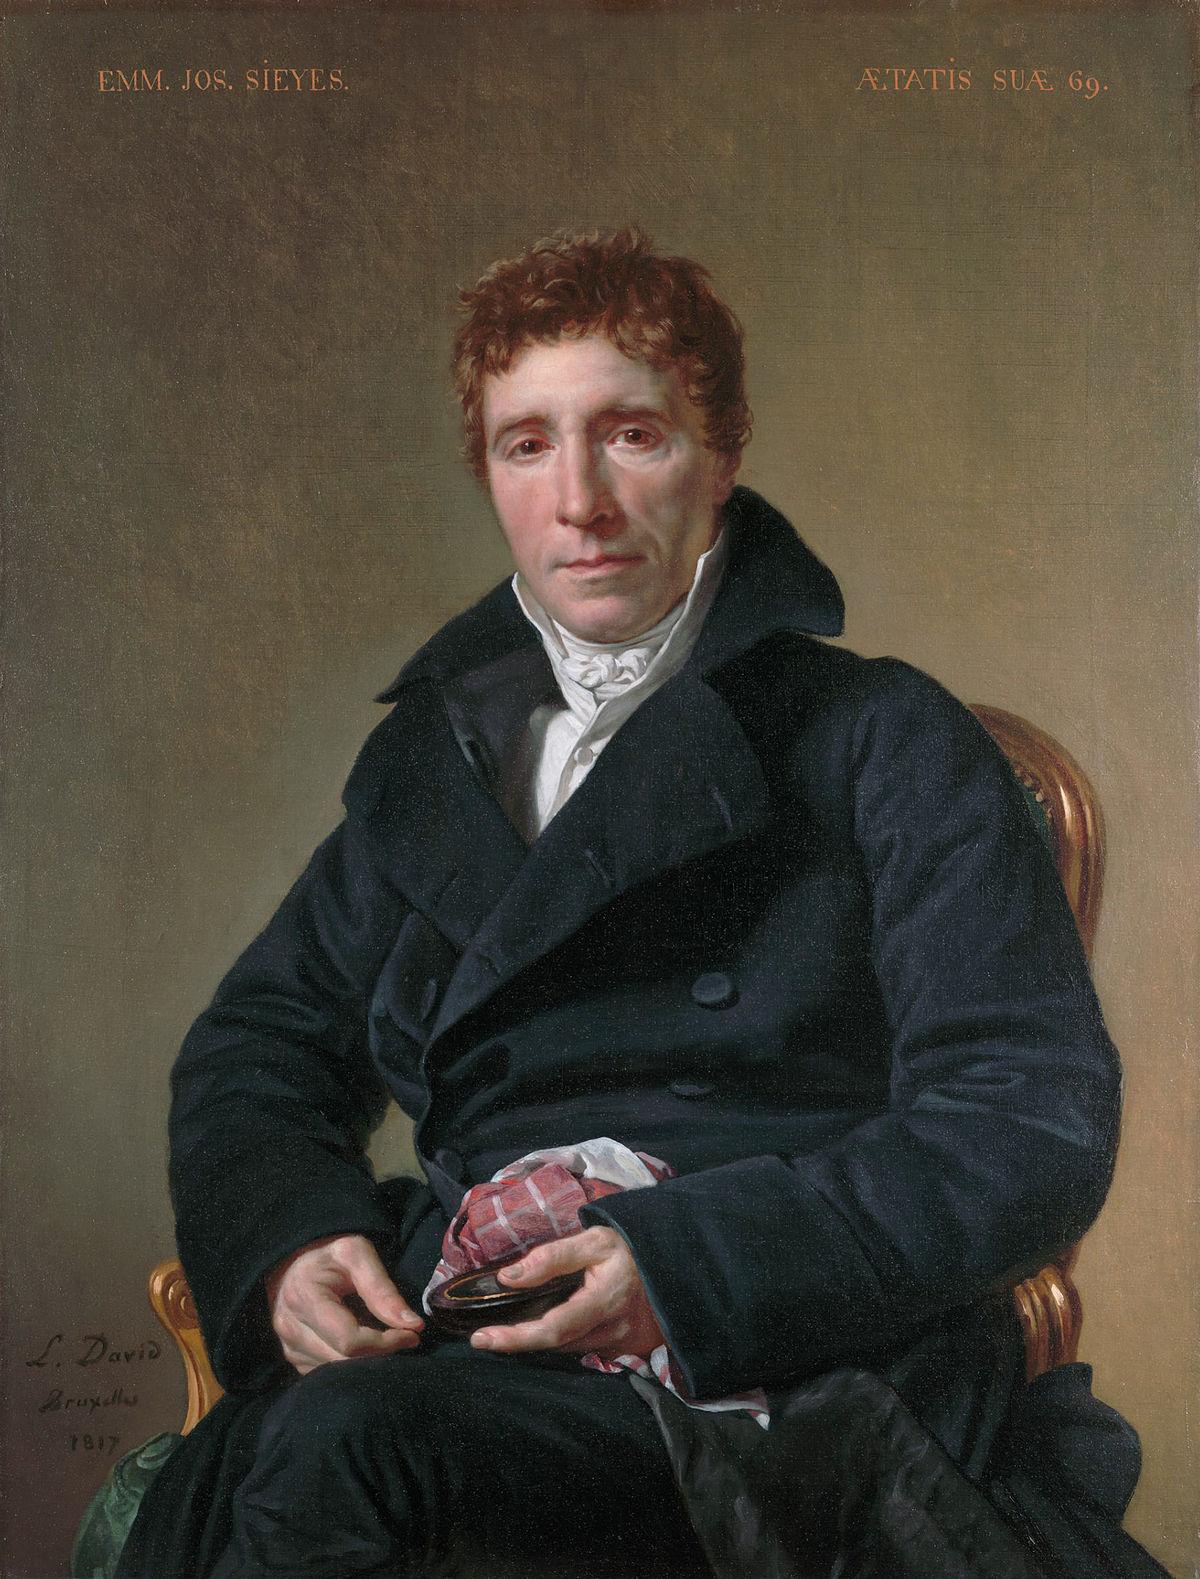 An examination of emmanuel joseph sieyess notion of the third estate